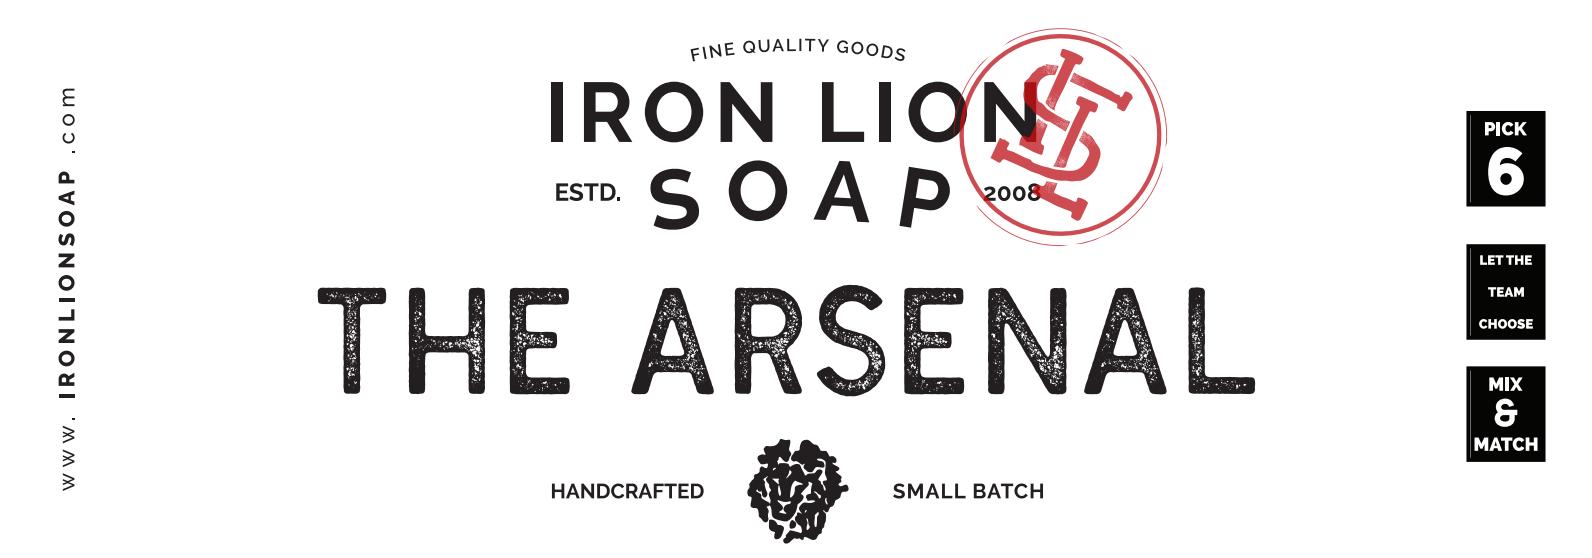 Six Pack Of Soap